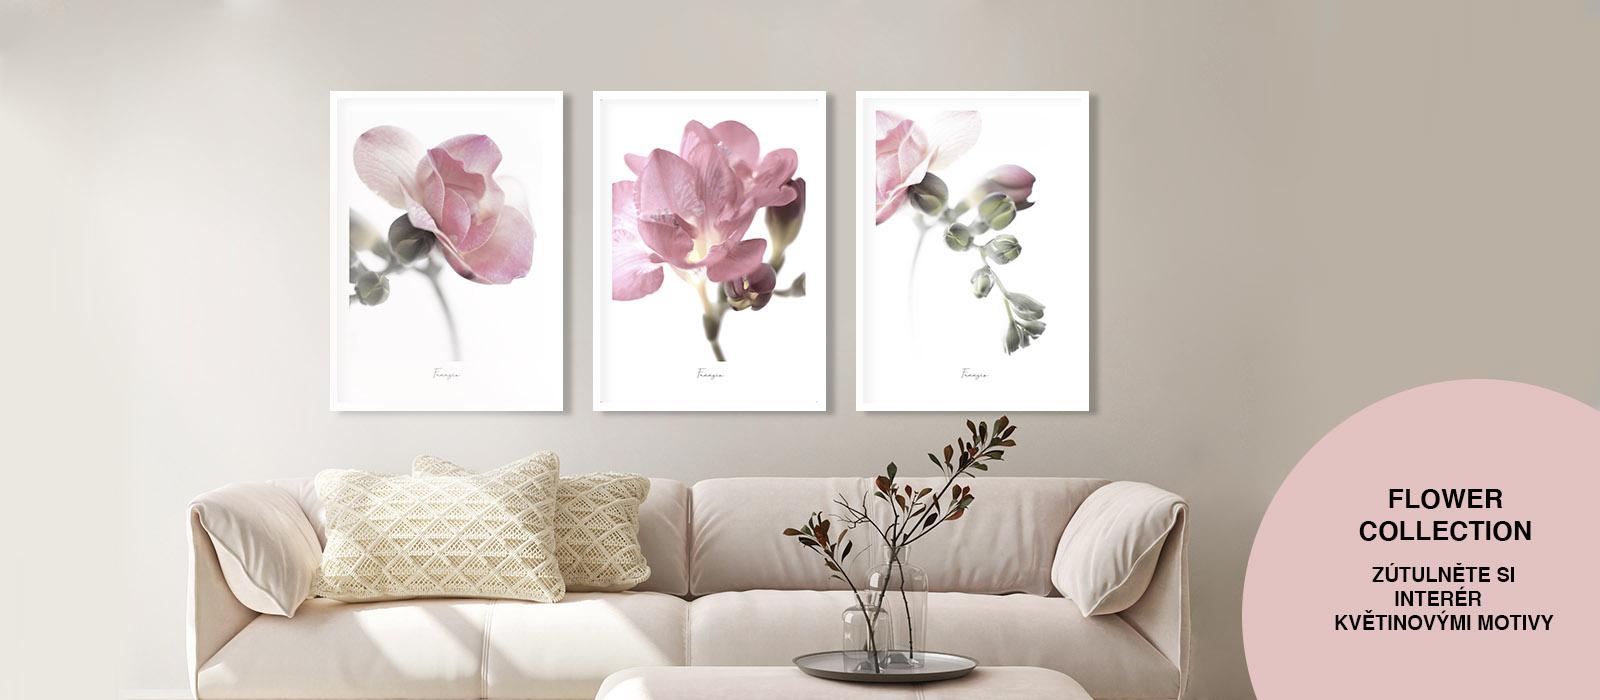 květina obraz laforma design studio